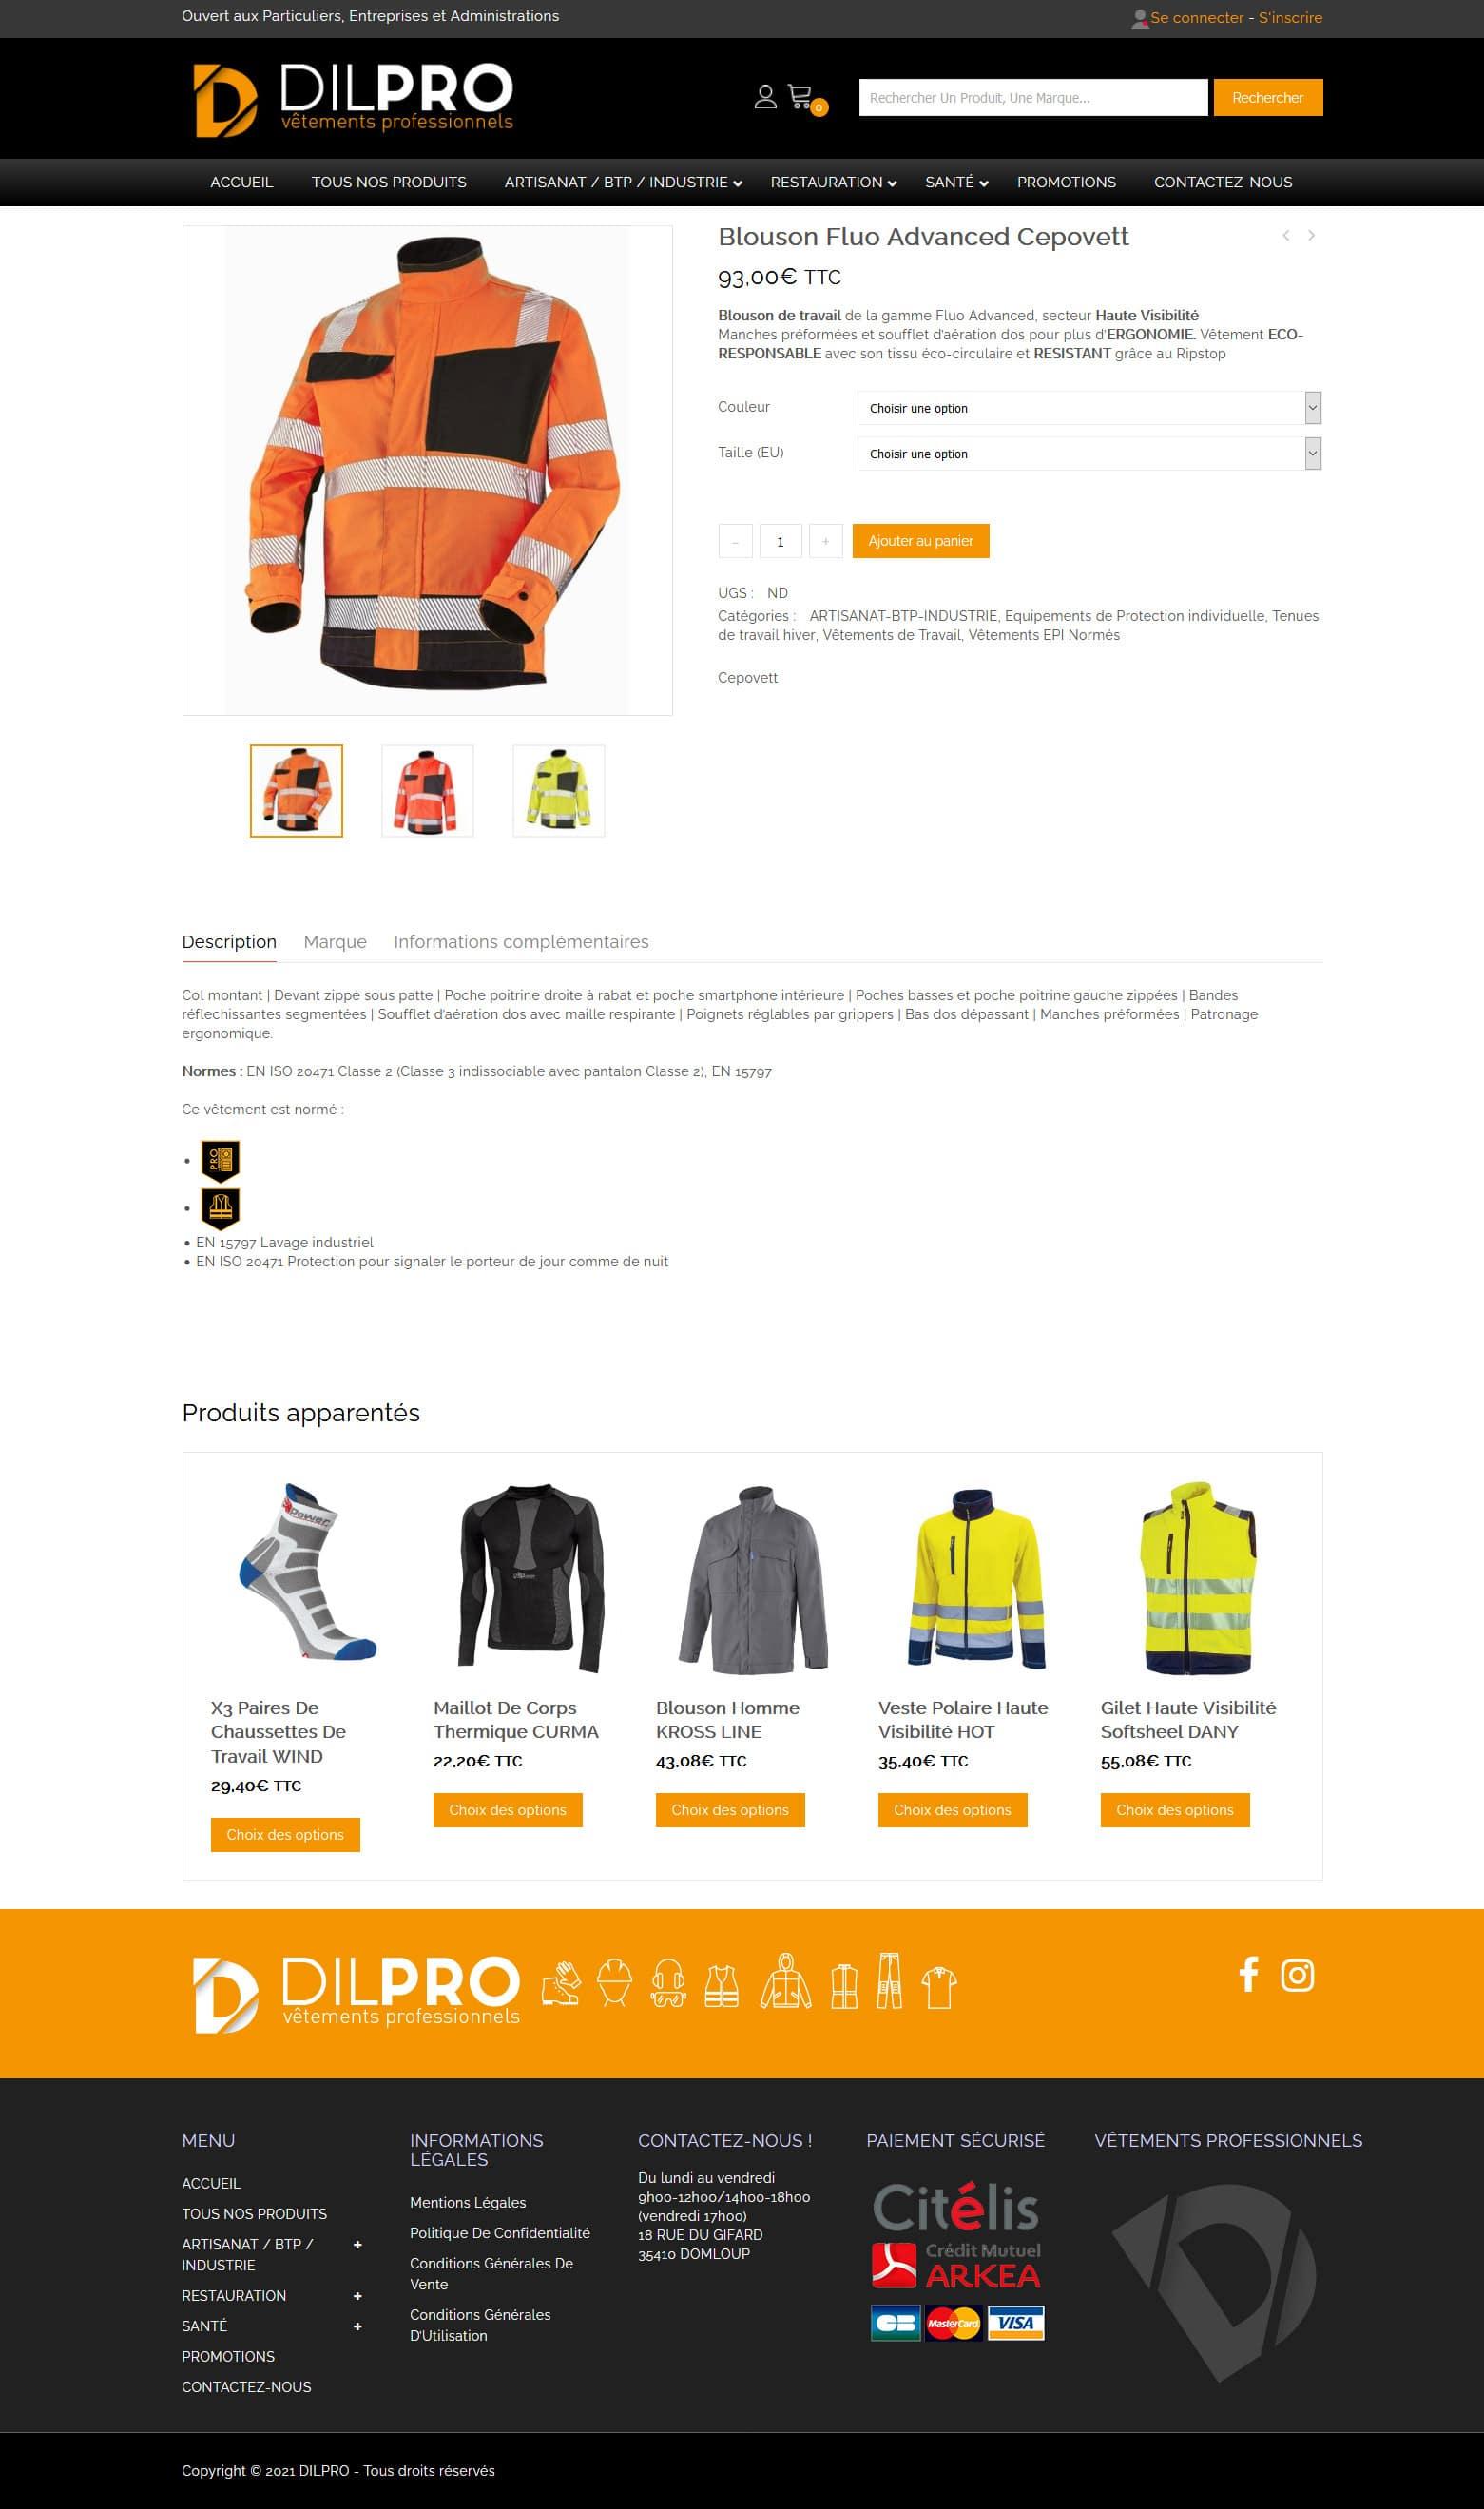 site de vente en ligne Rennes1